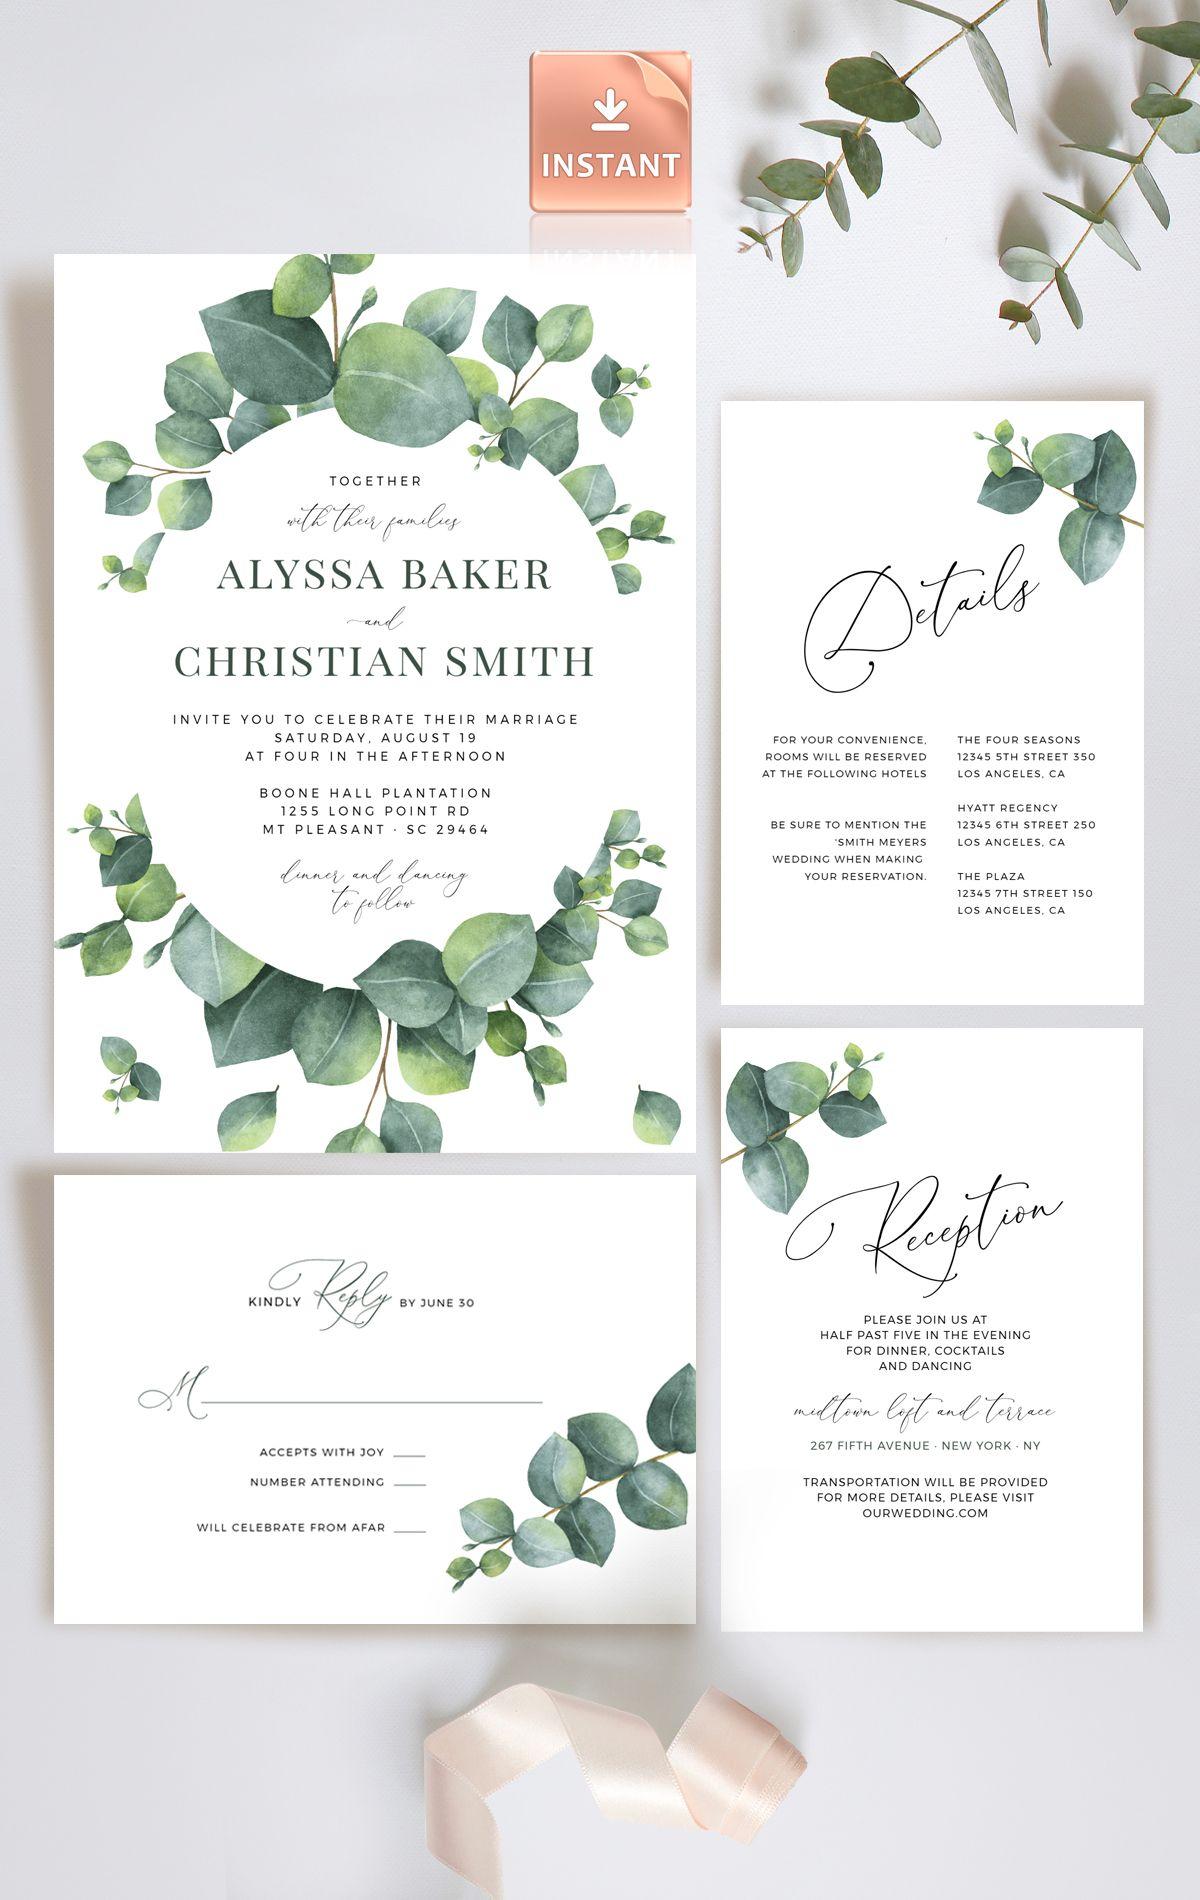 Pale Green Eucalyptus Wedding Invitation Modern Invite  Etsy in